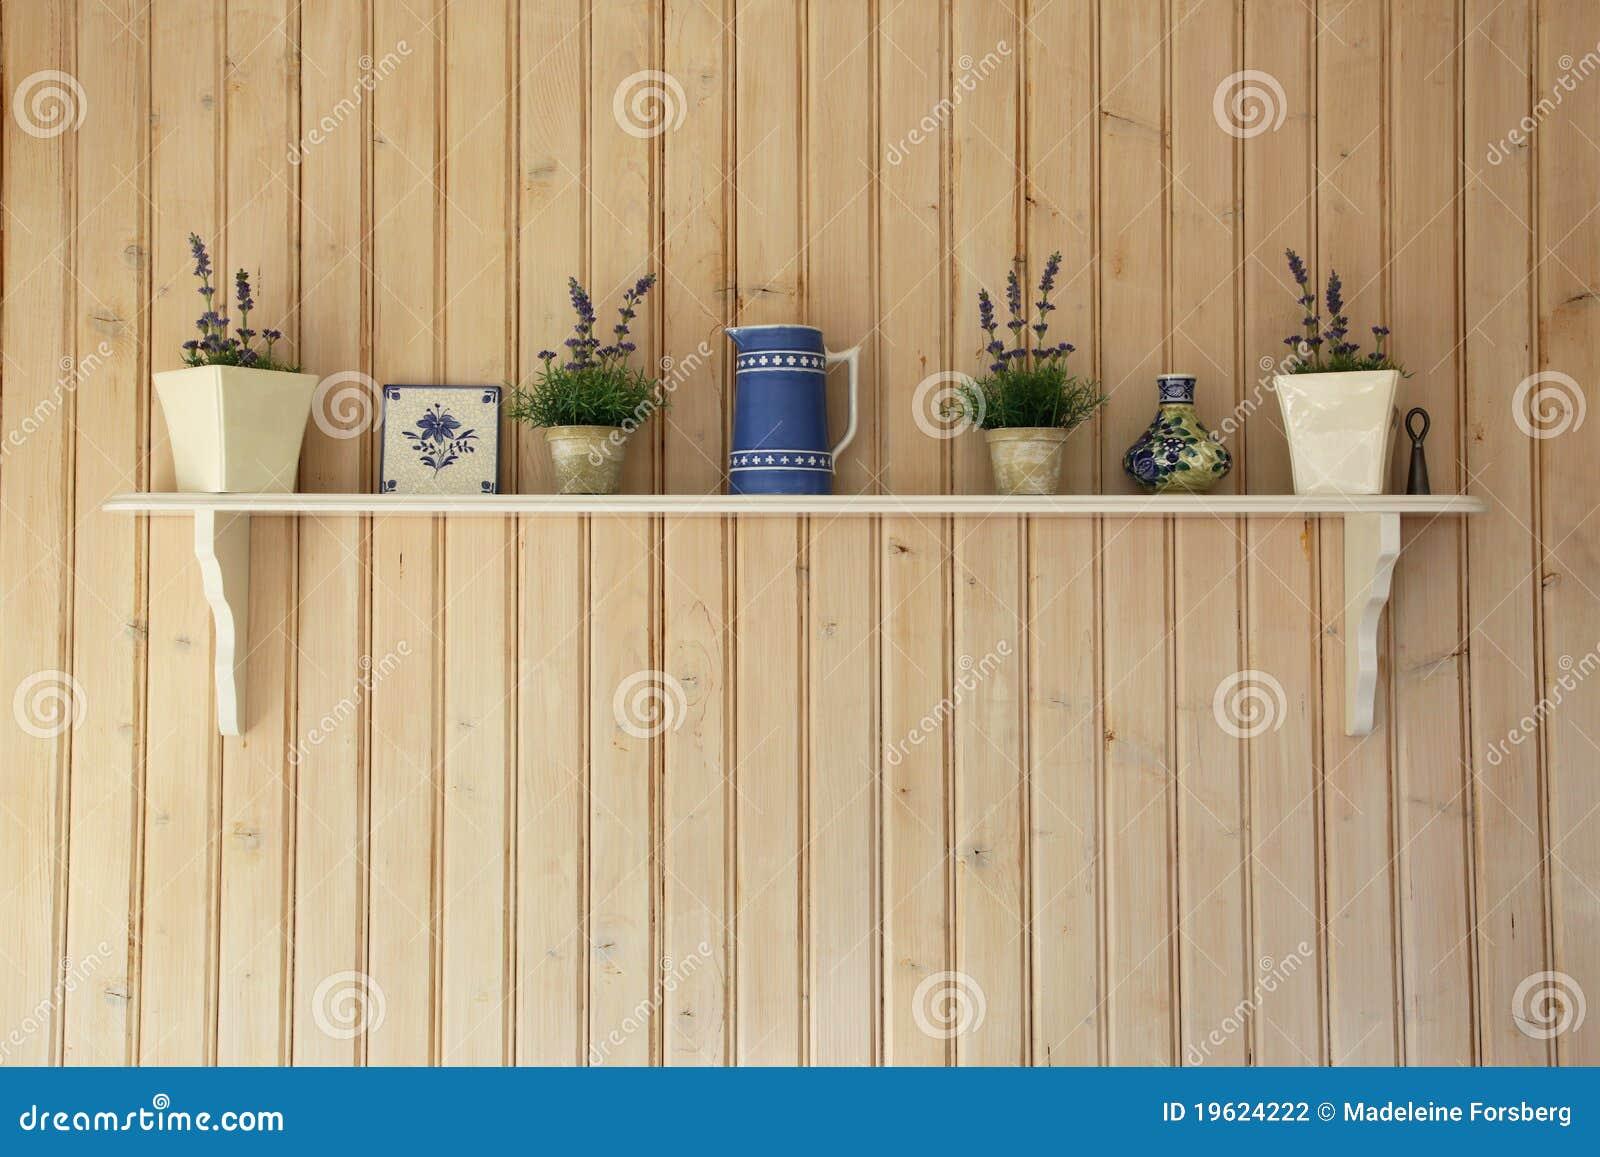 Plank keuken free plank keuken with plank keuken keuken